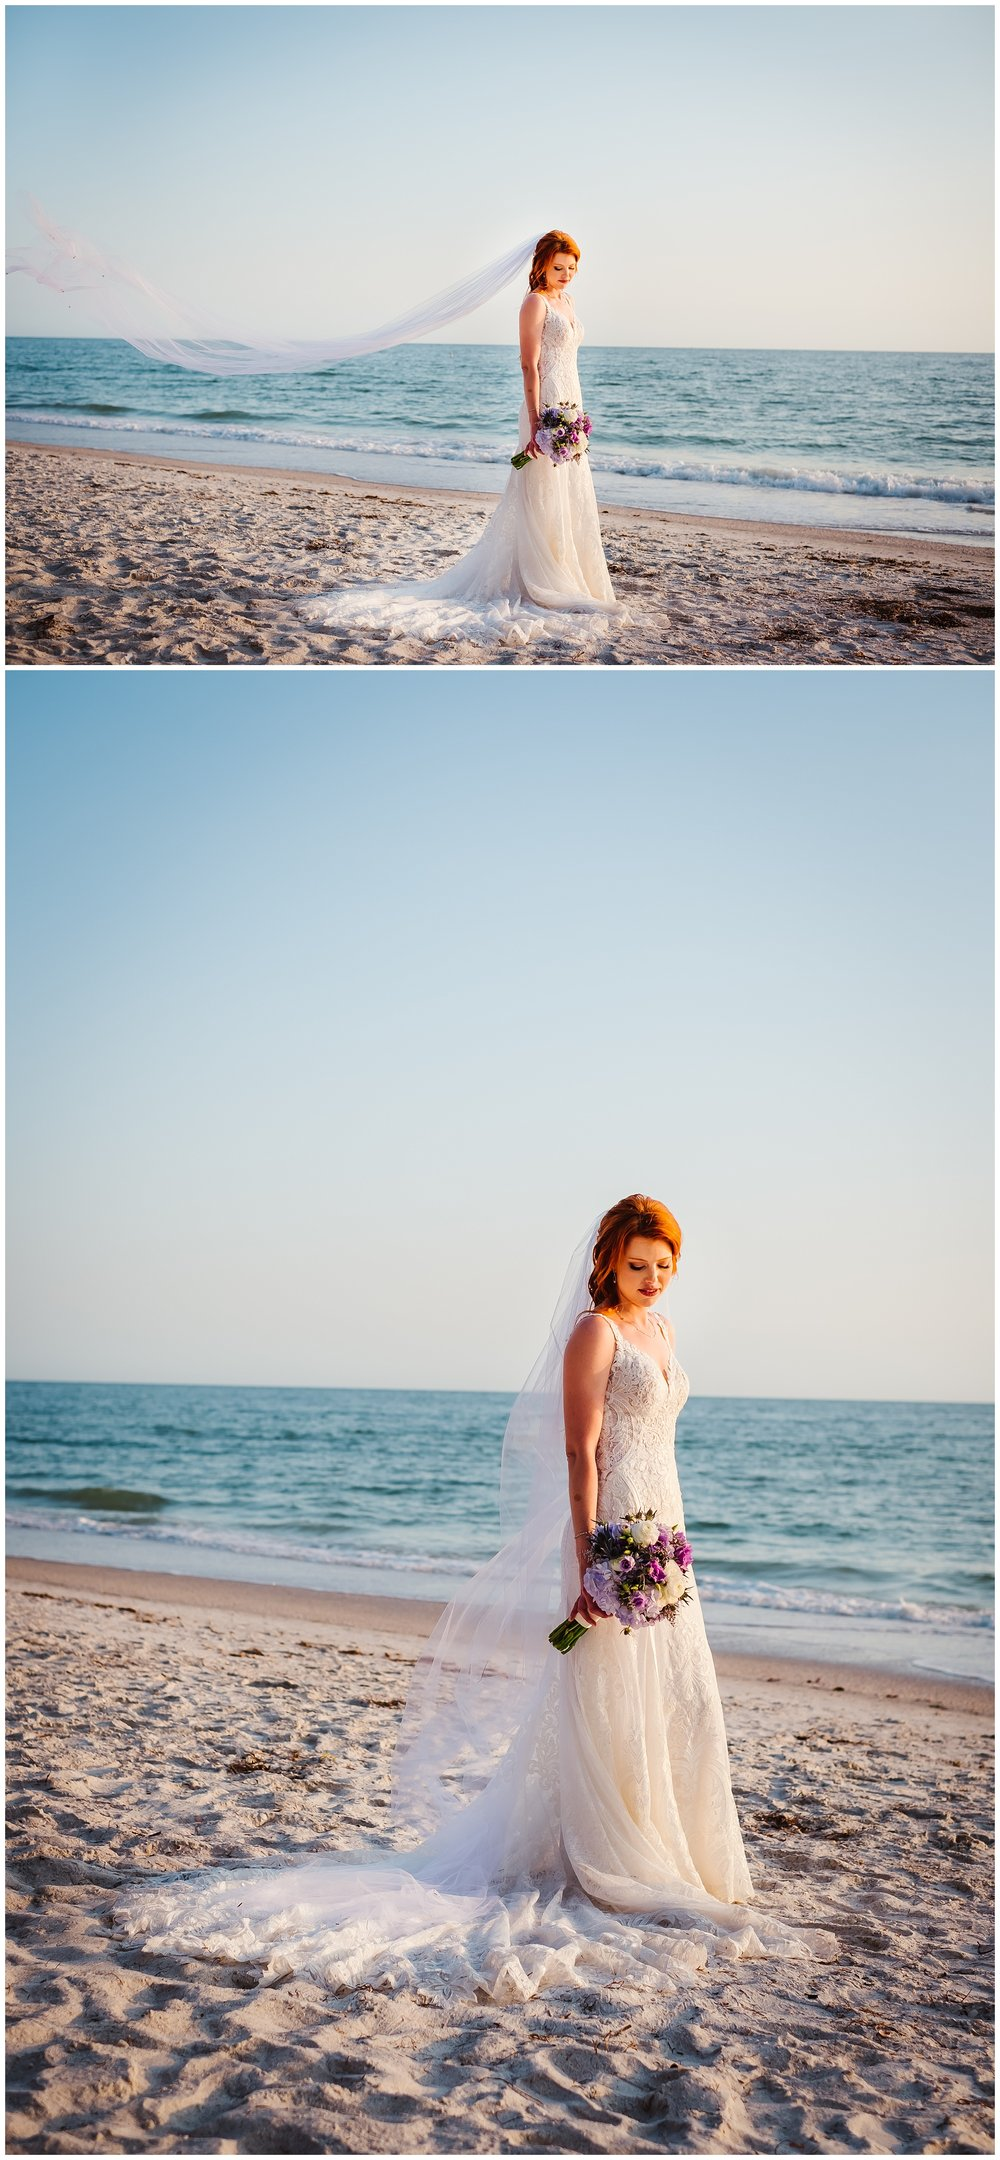 tampa-st-pete-wedding-photographer-indian-rocks-beach-mermaid-train-redhead_0151.jpg